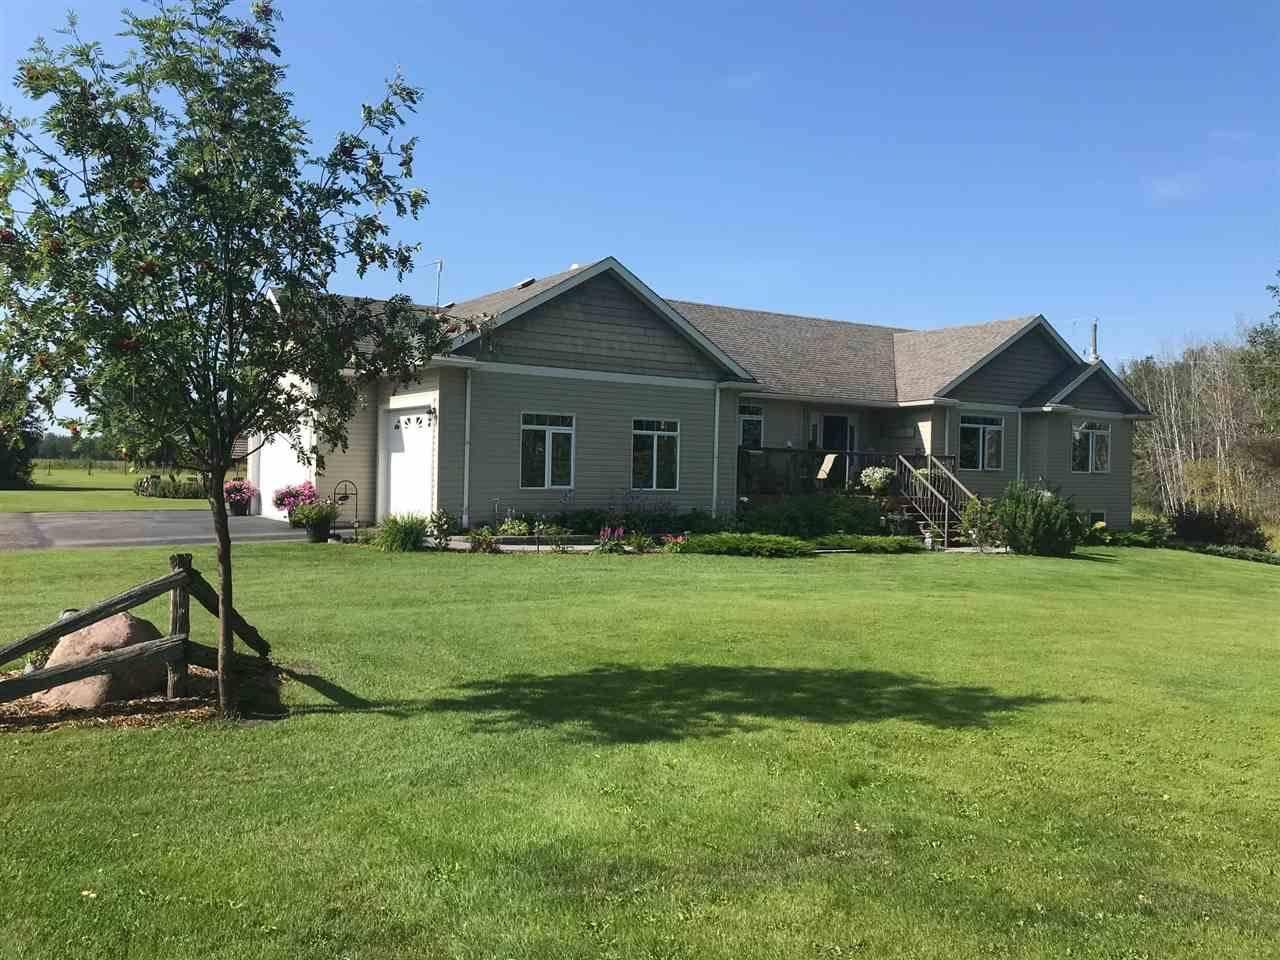 House for sale at 43313 Twp Rd Rural Bonnyville M.d. Alberta - MLS: E4155556